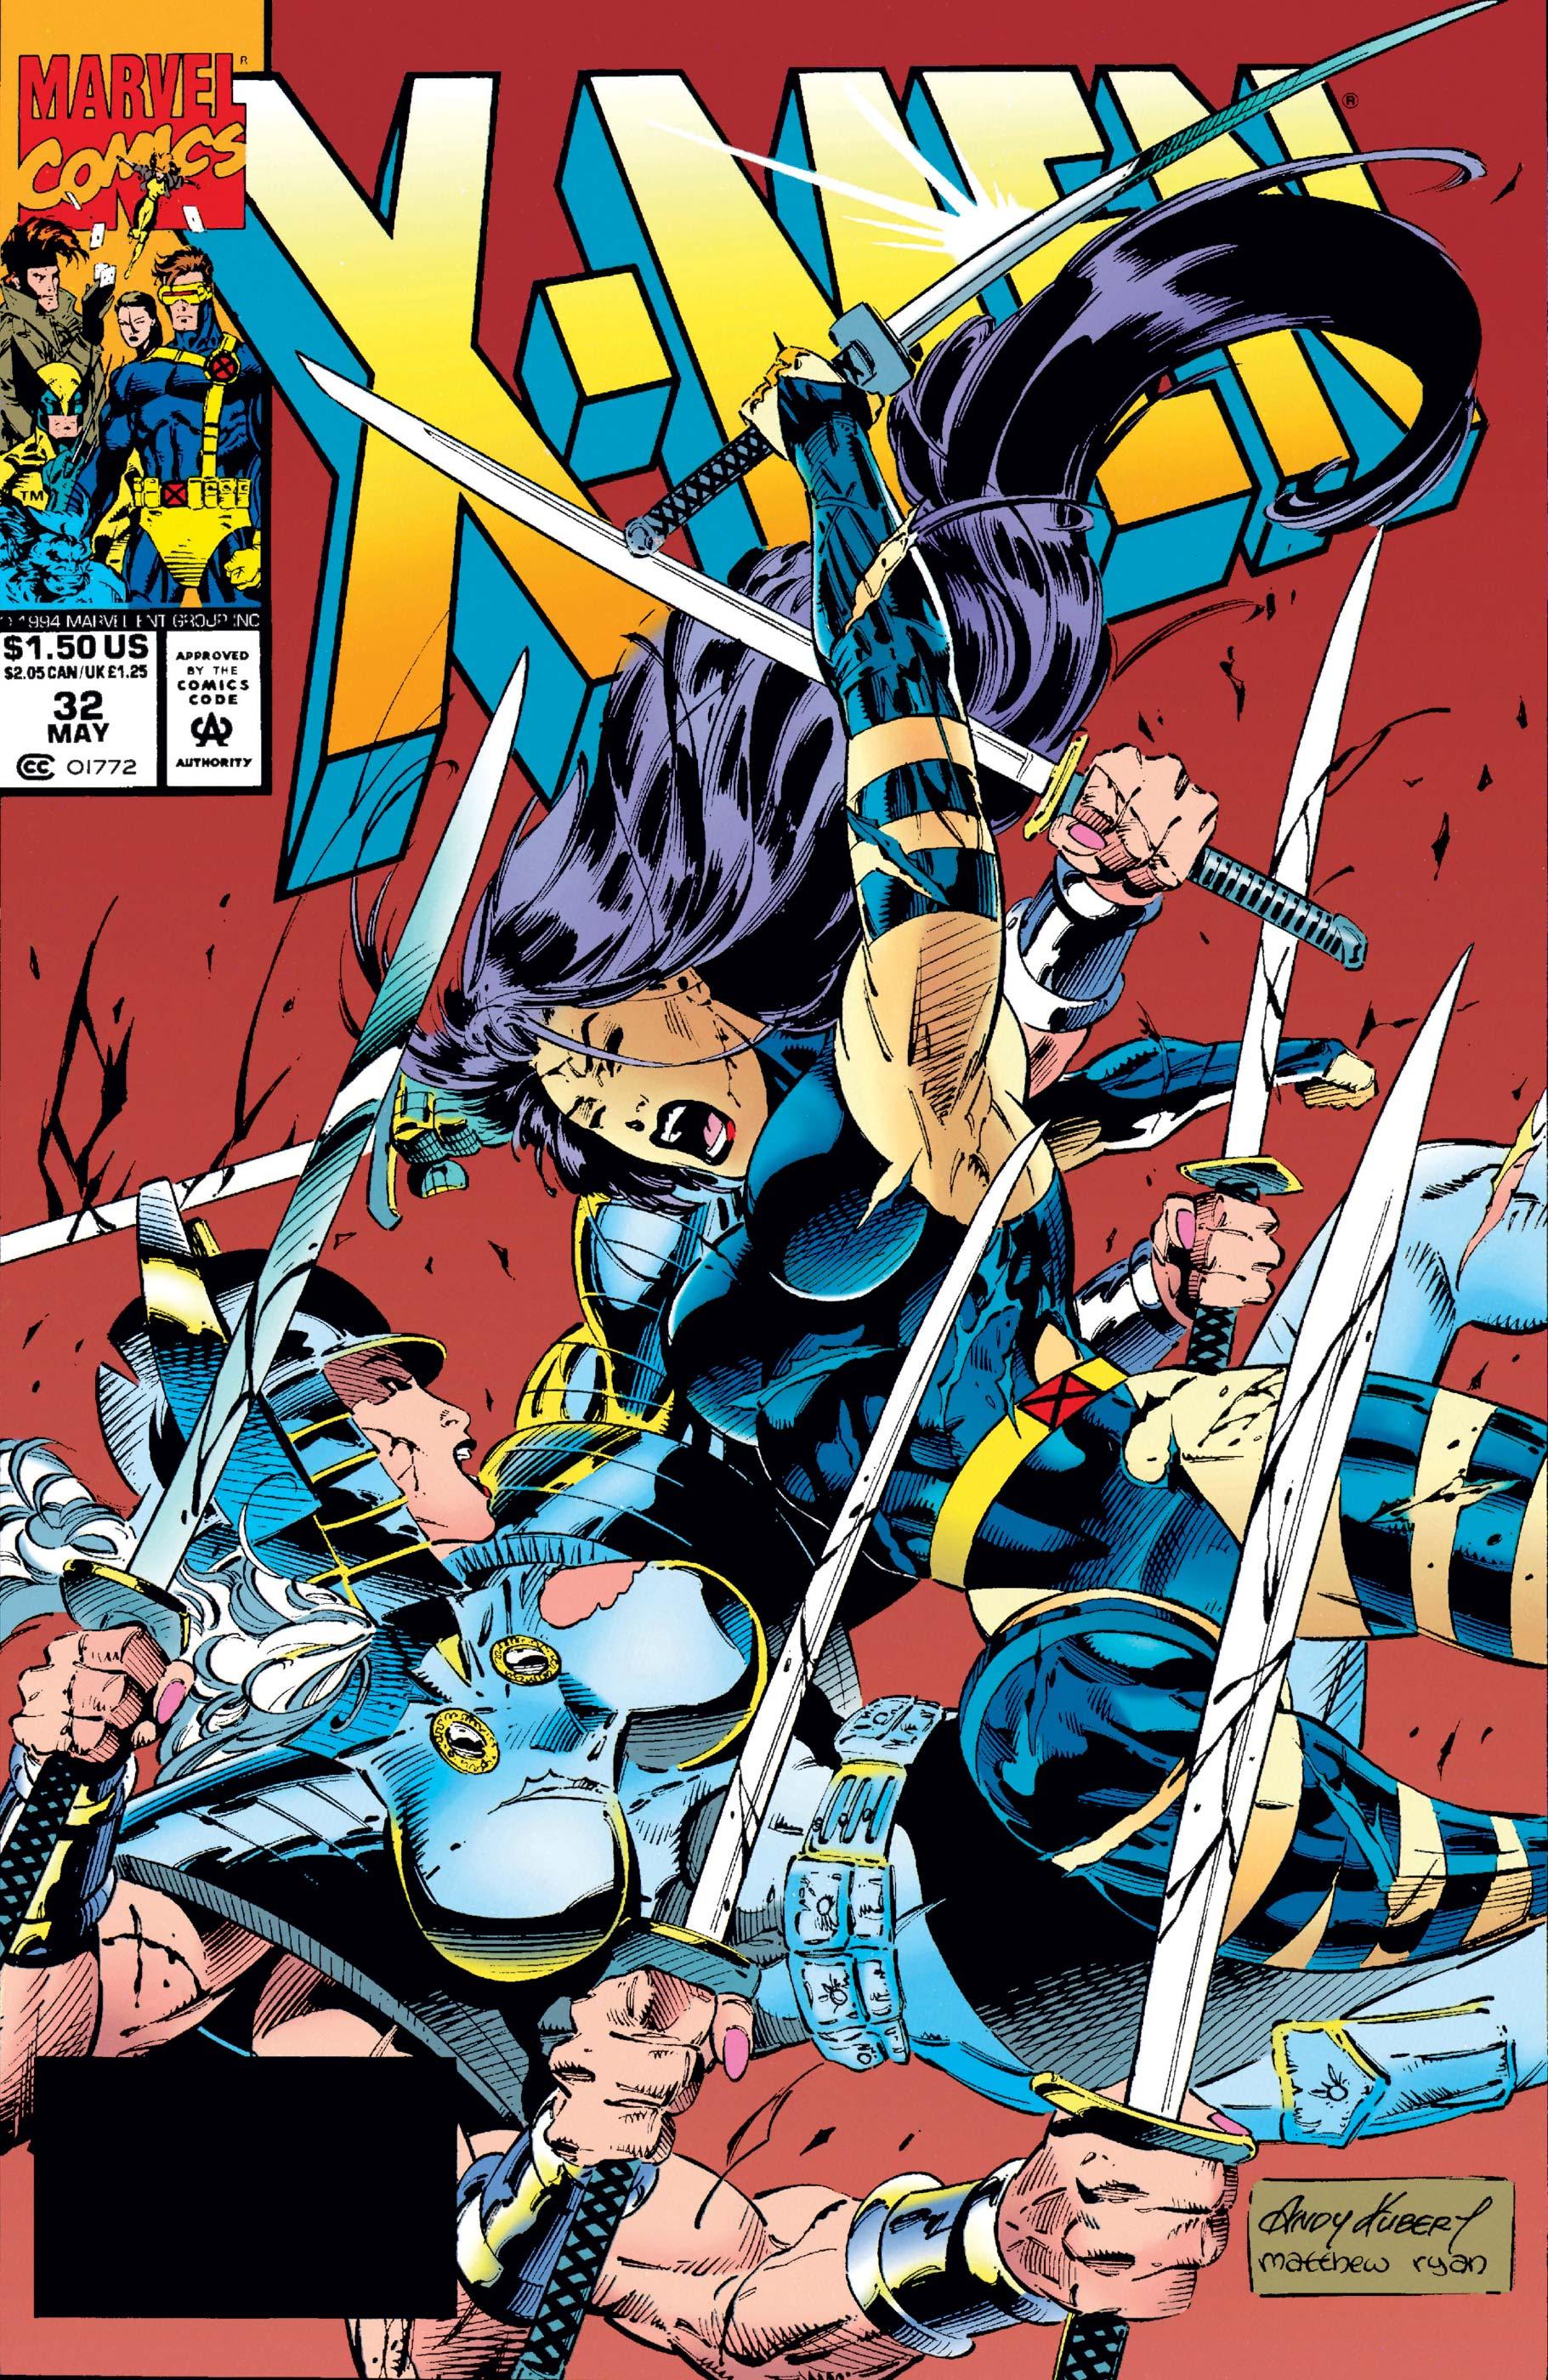 X-Men (1991) #32